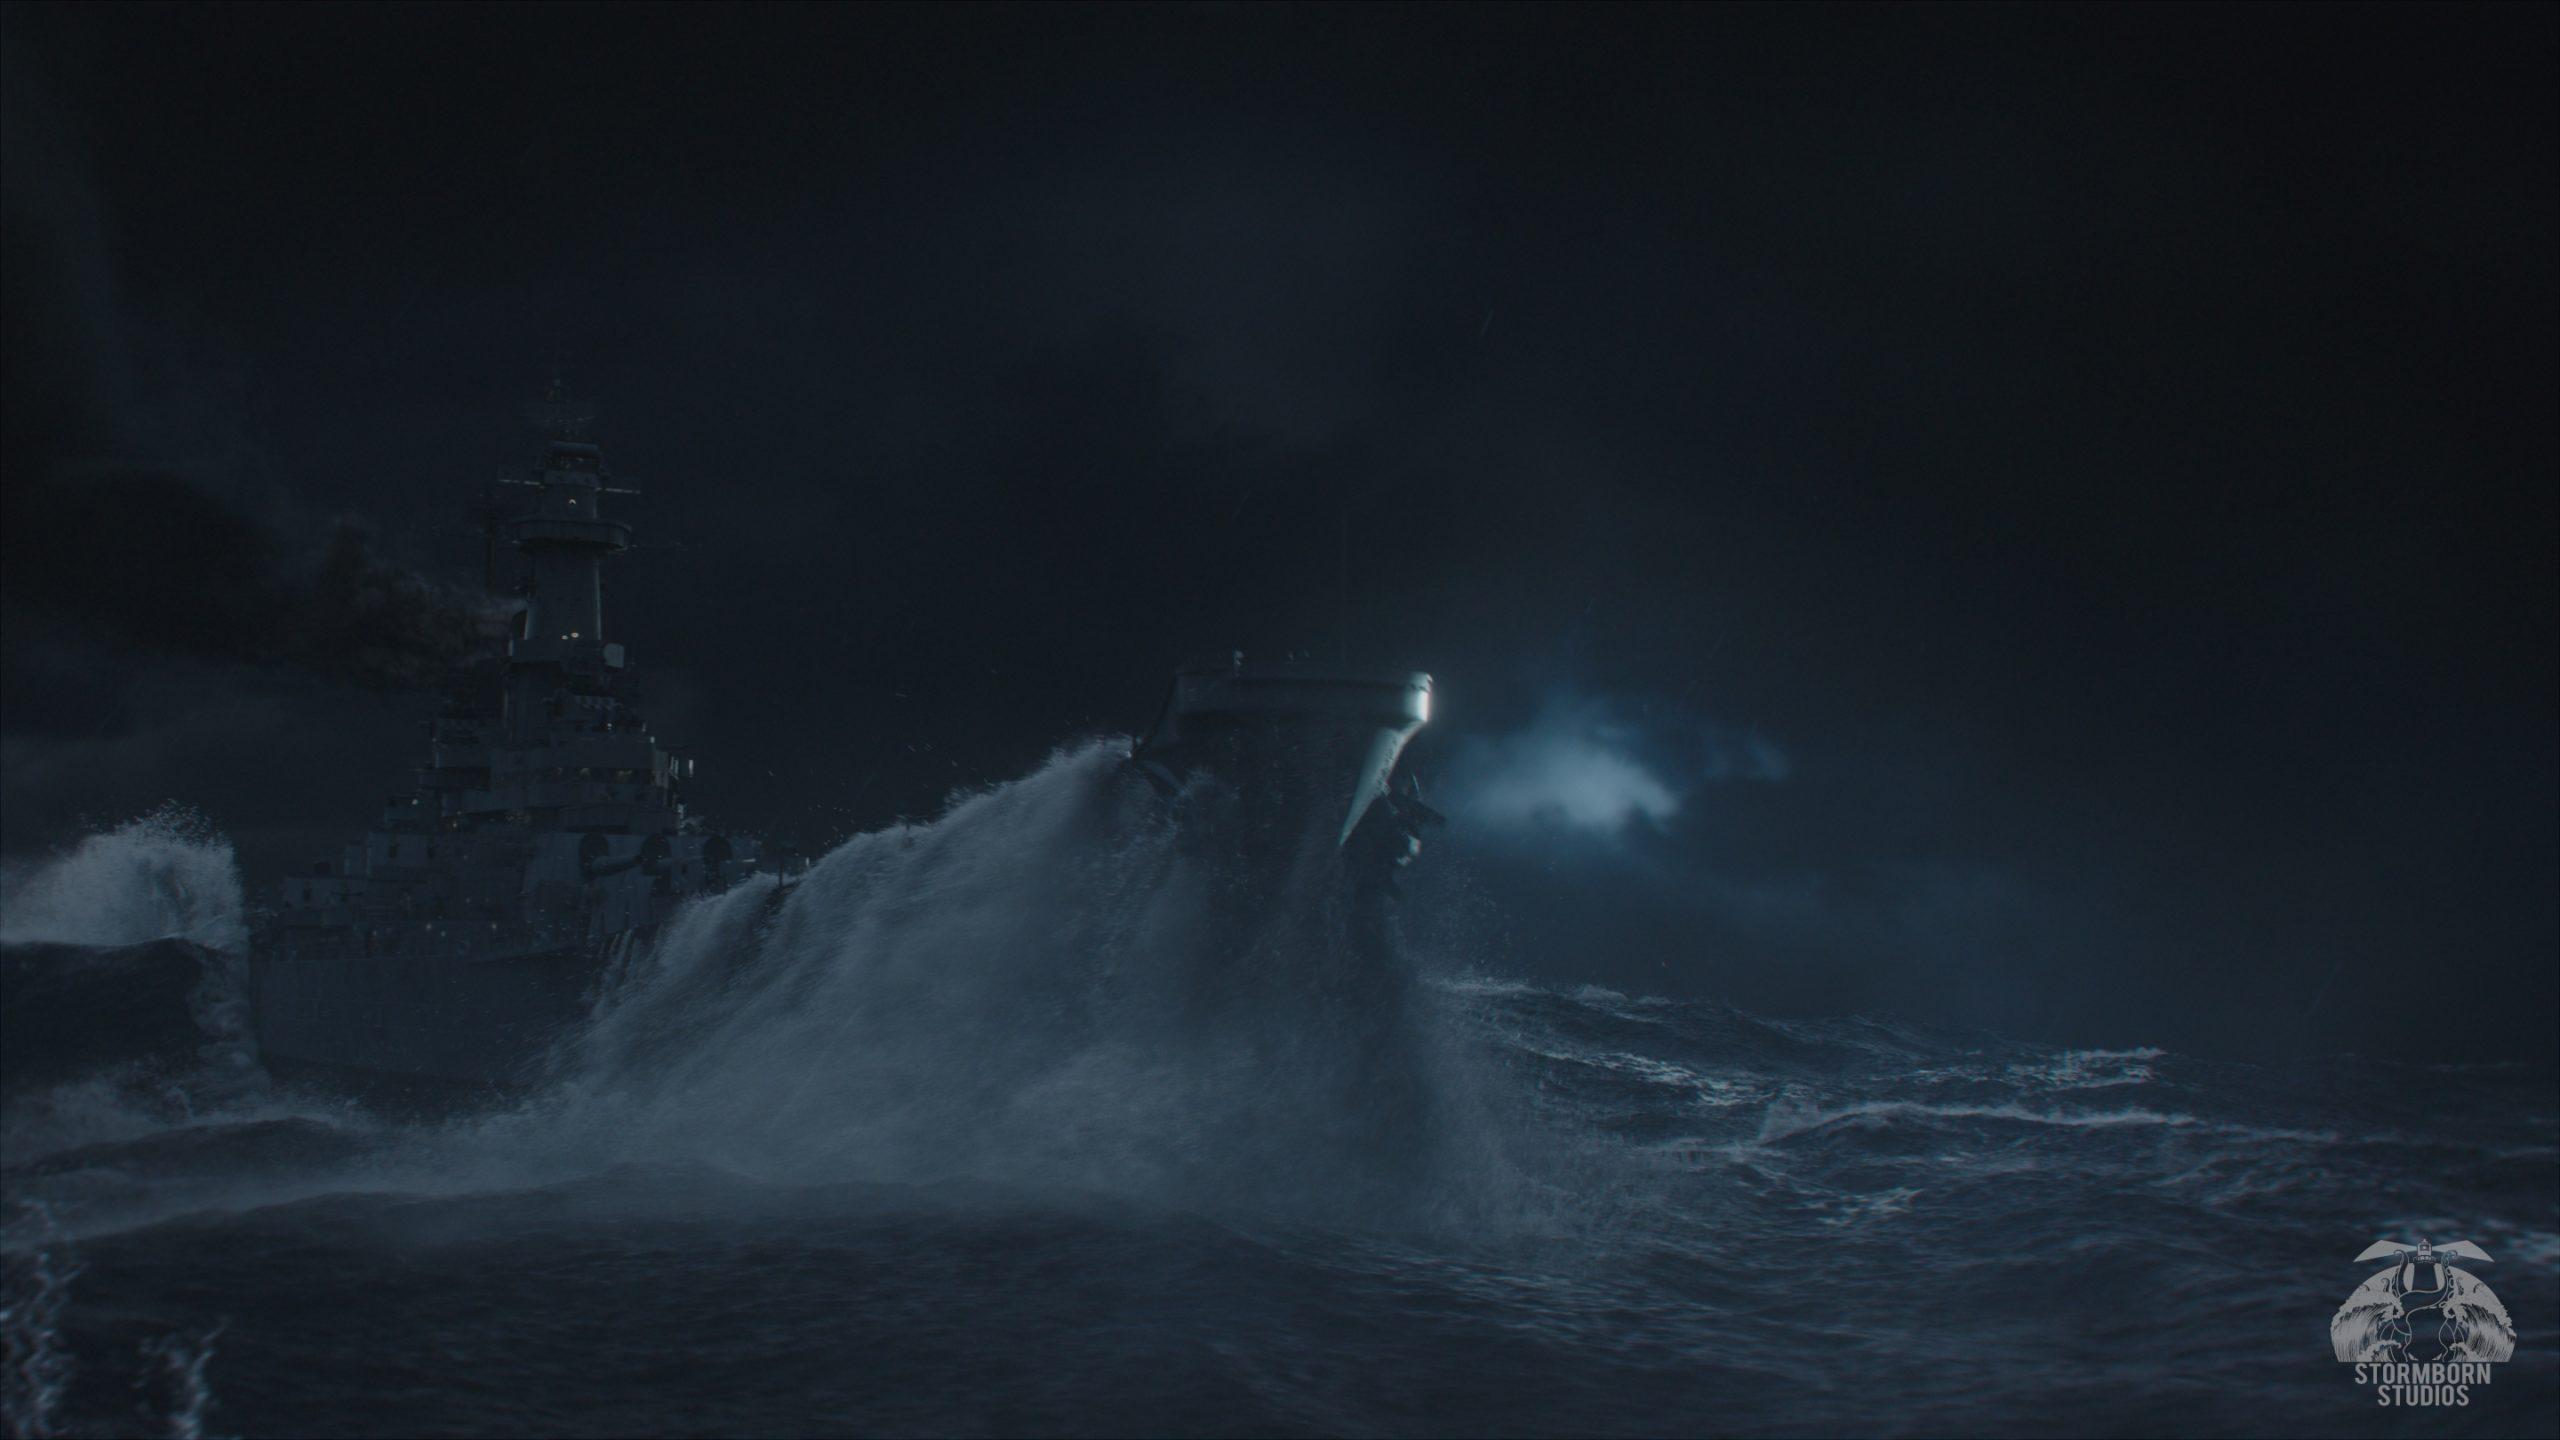 Stormborn Studios Ship in tidal wave